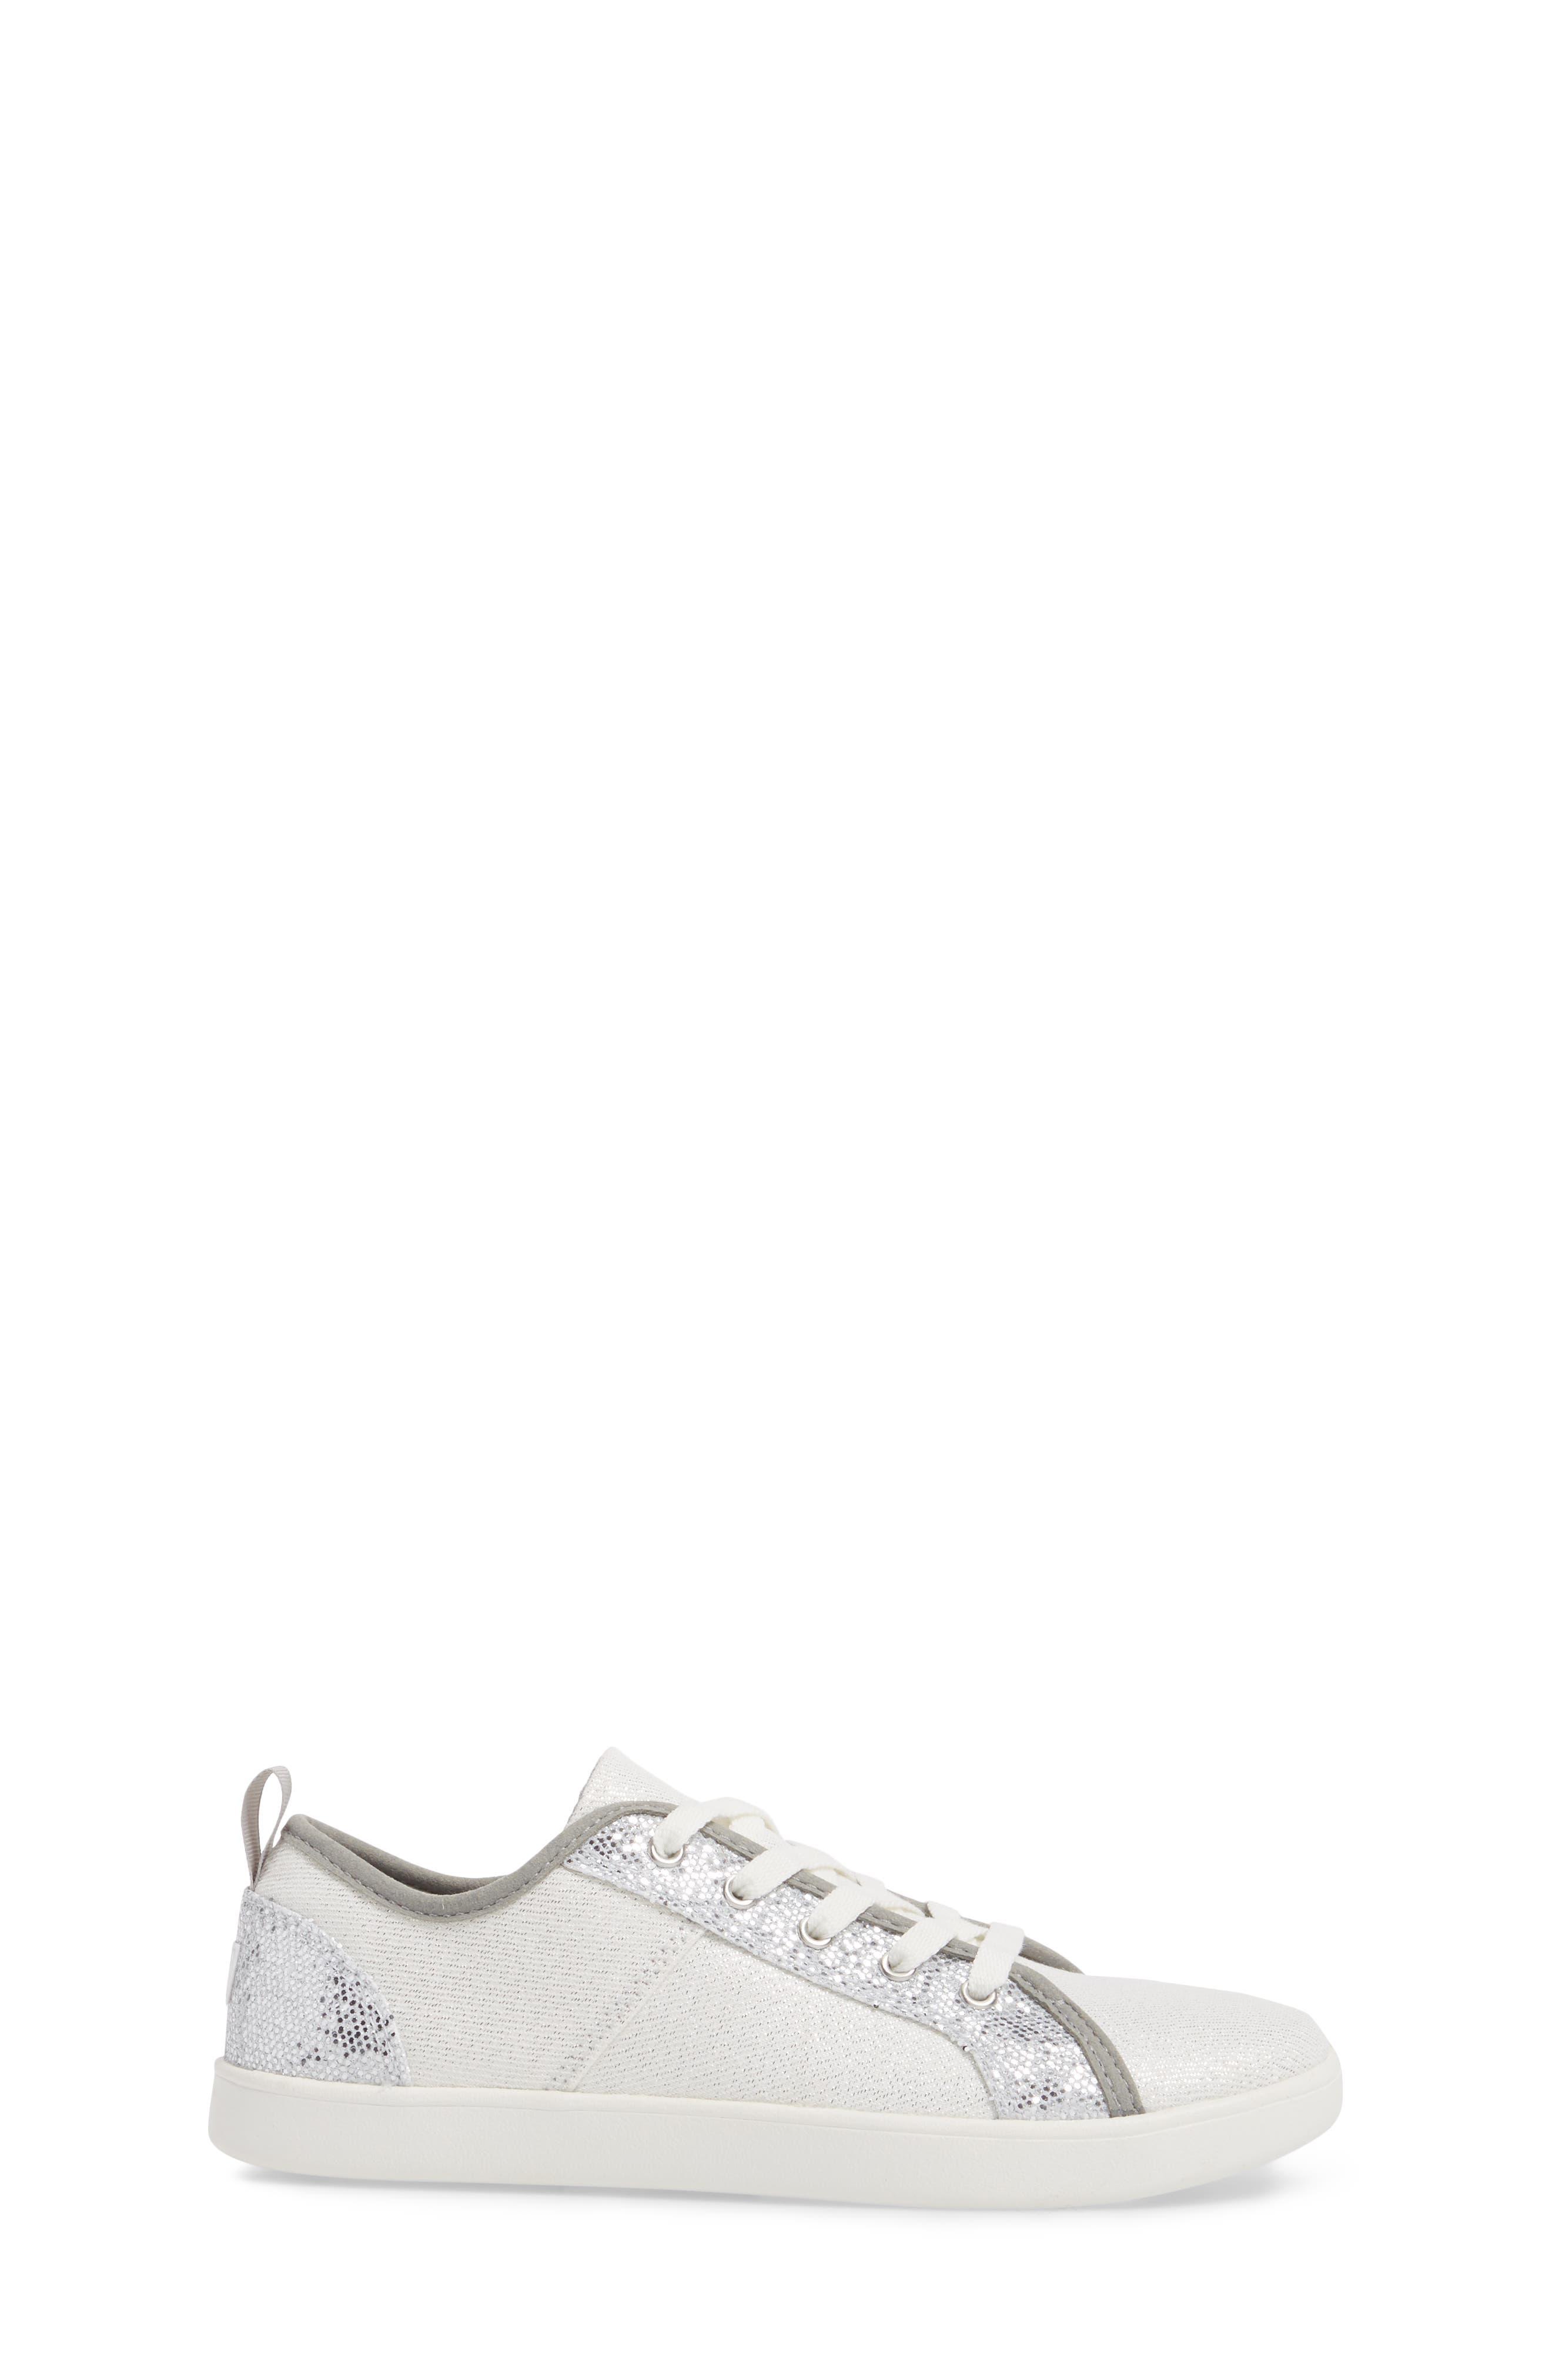 Irvin Sparkles Metallic Sneaker,                             Alternate thumbnail 3, color,                             Silver